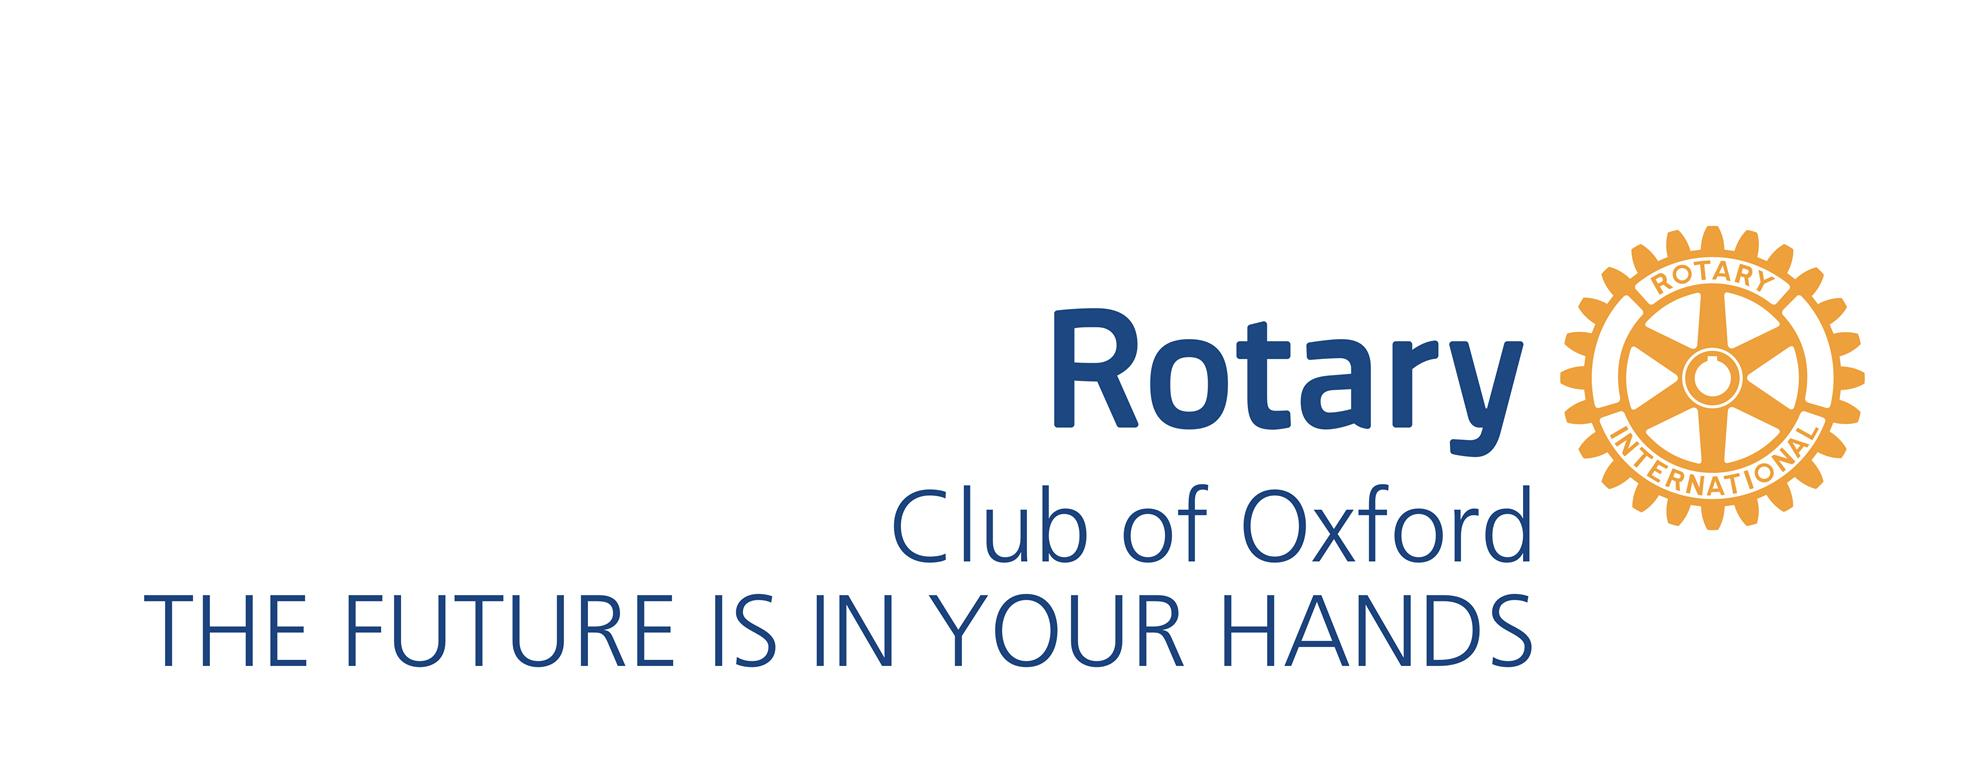 Oxford Rotary Club logo